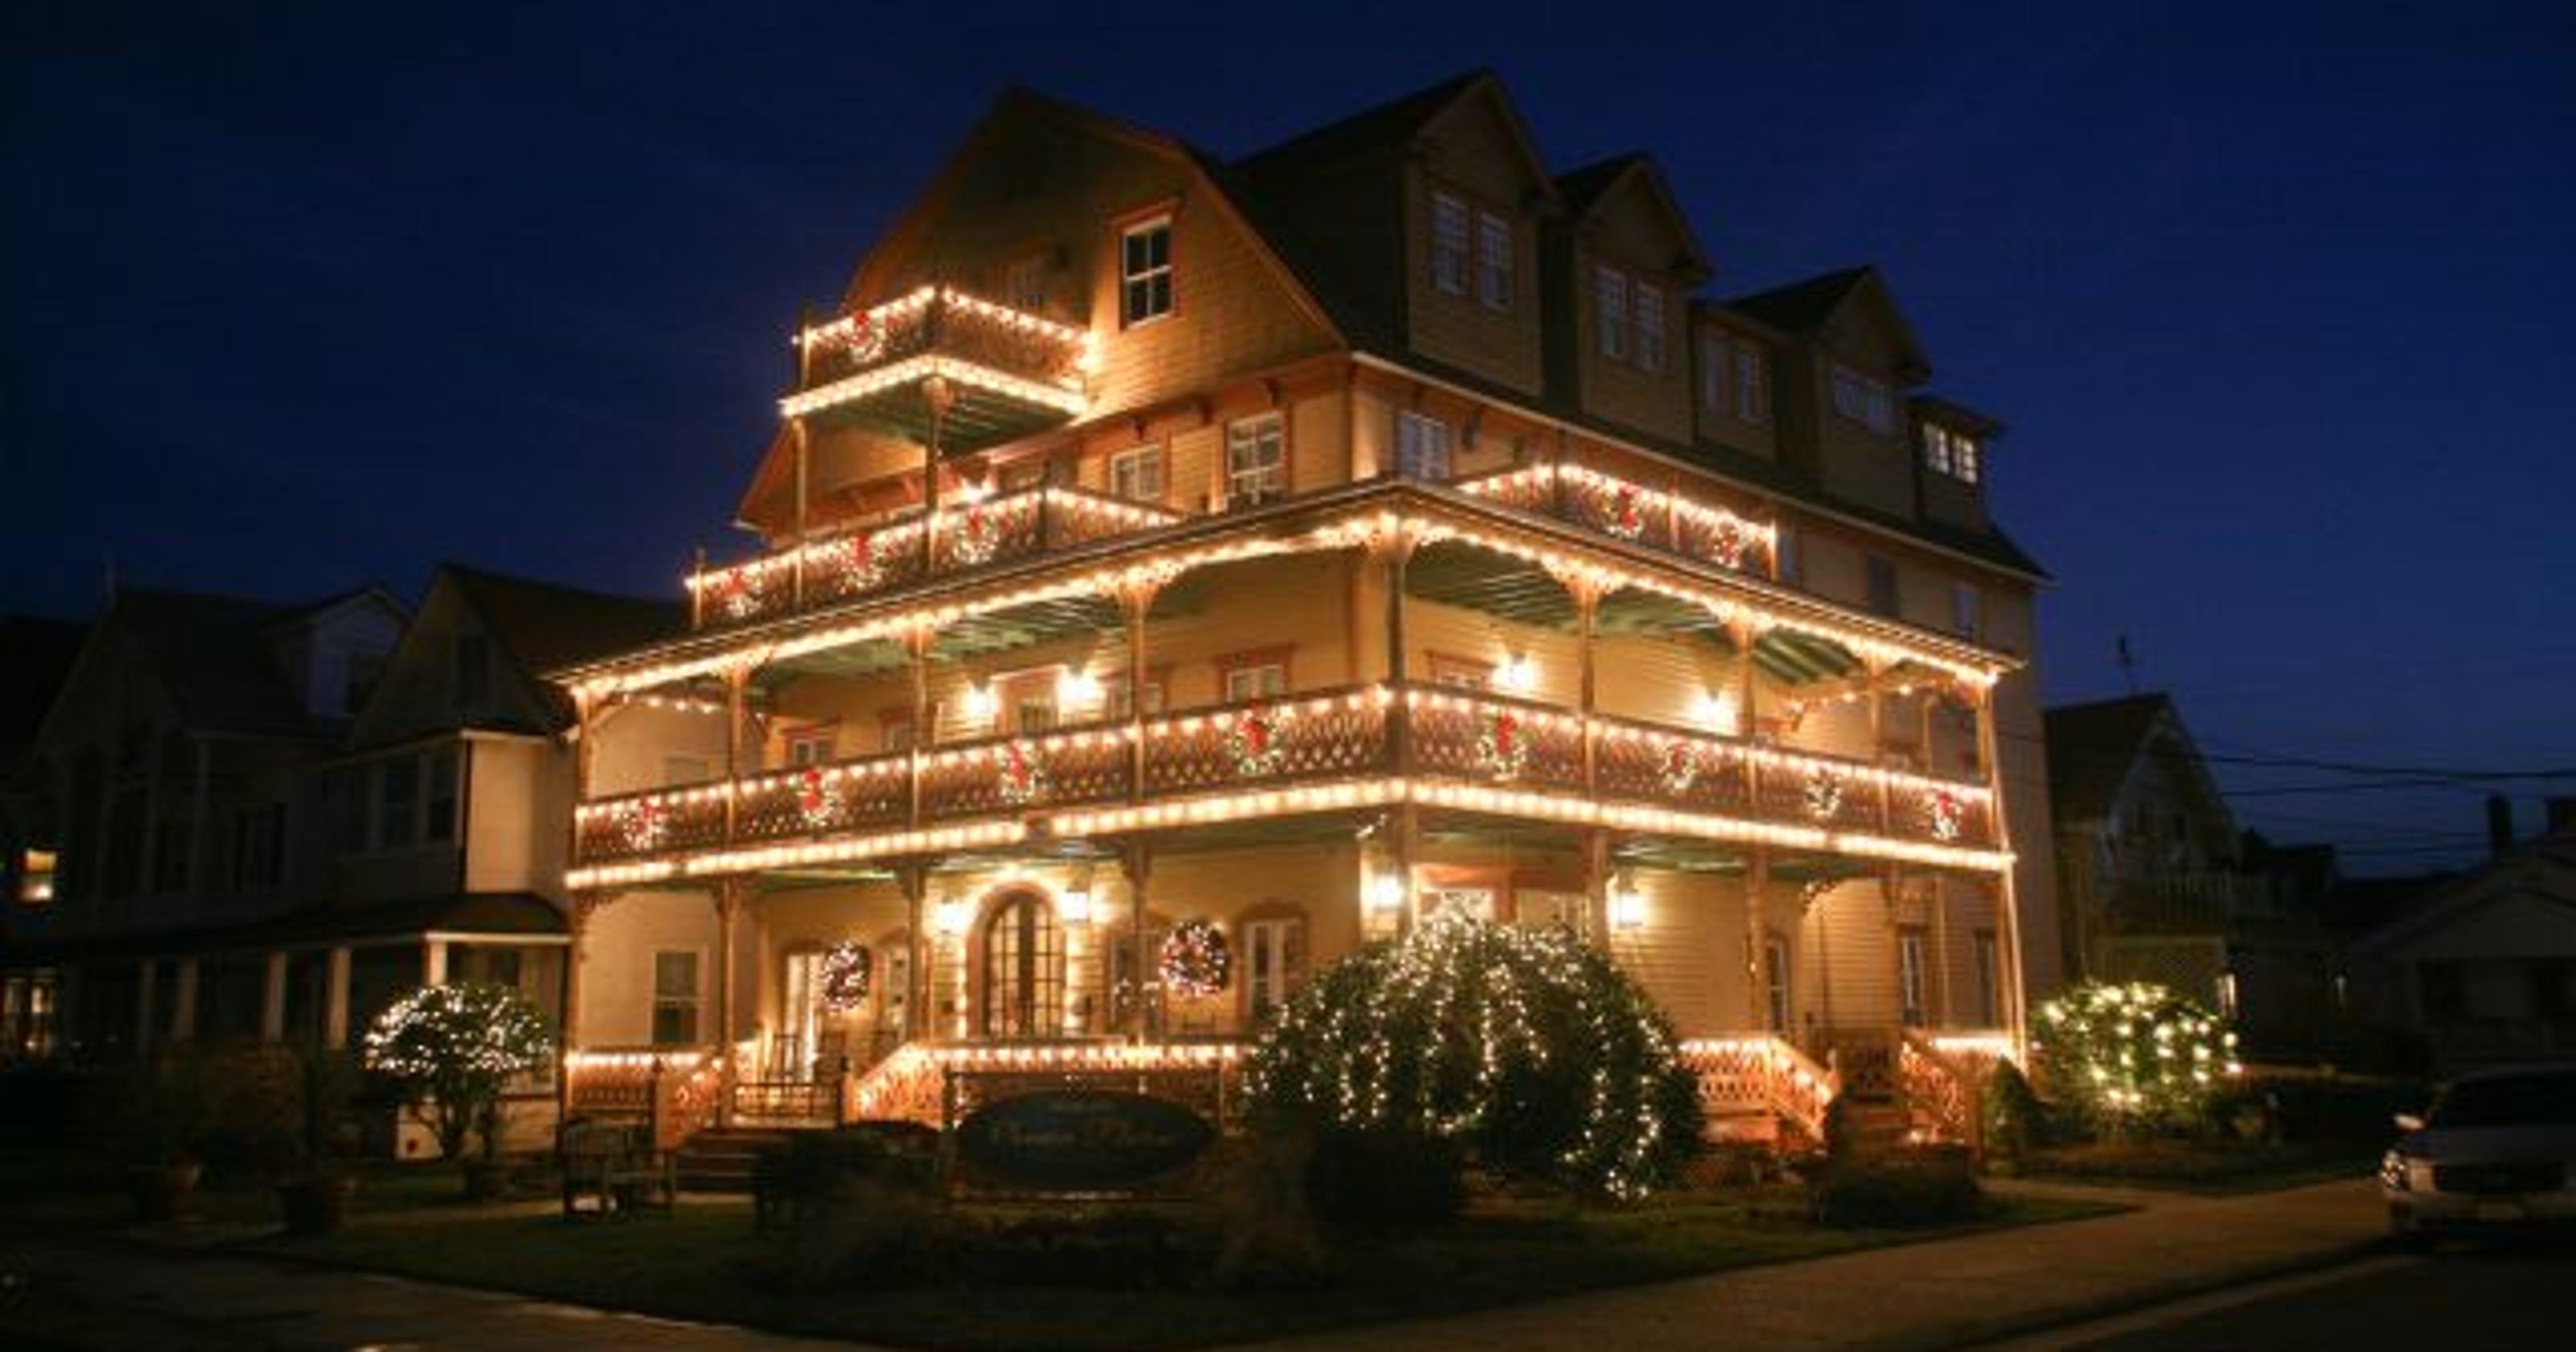 Ocean Grove To Host Holiday House And Inn Tour